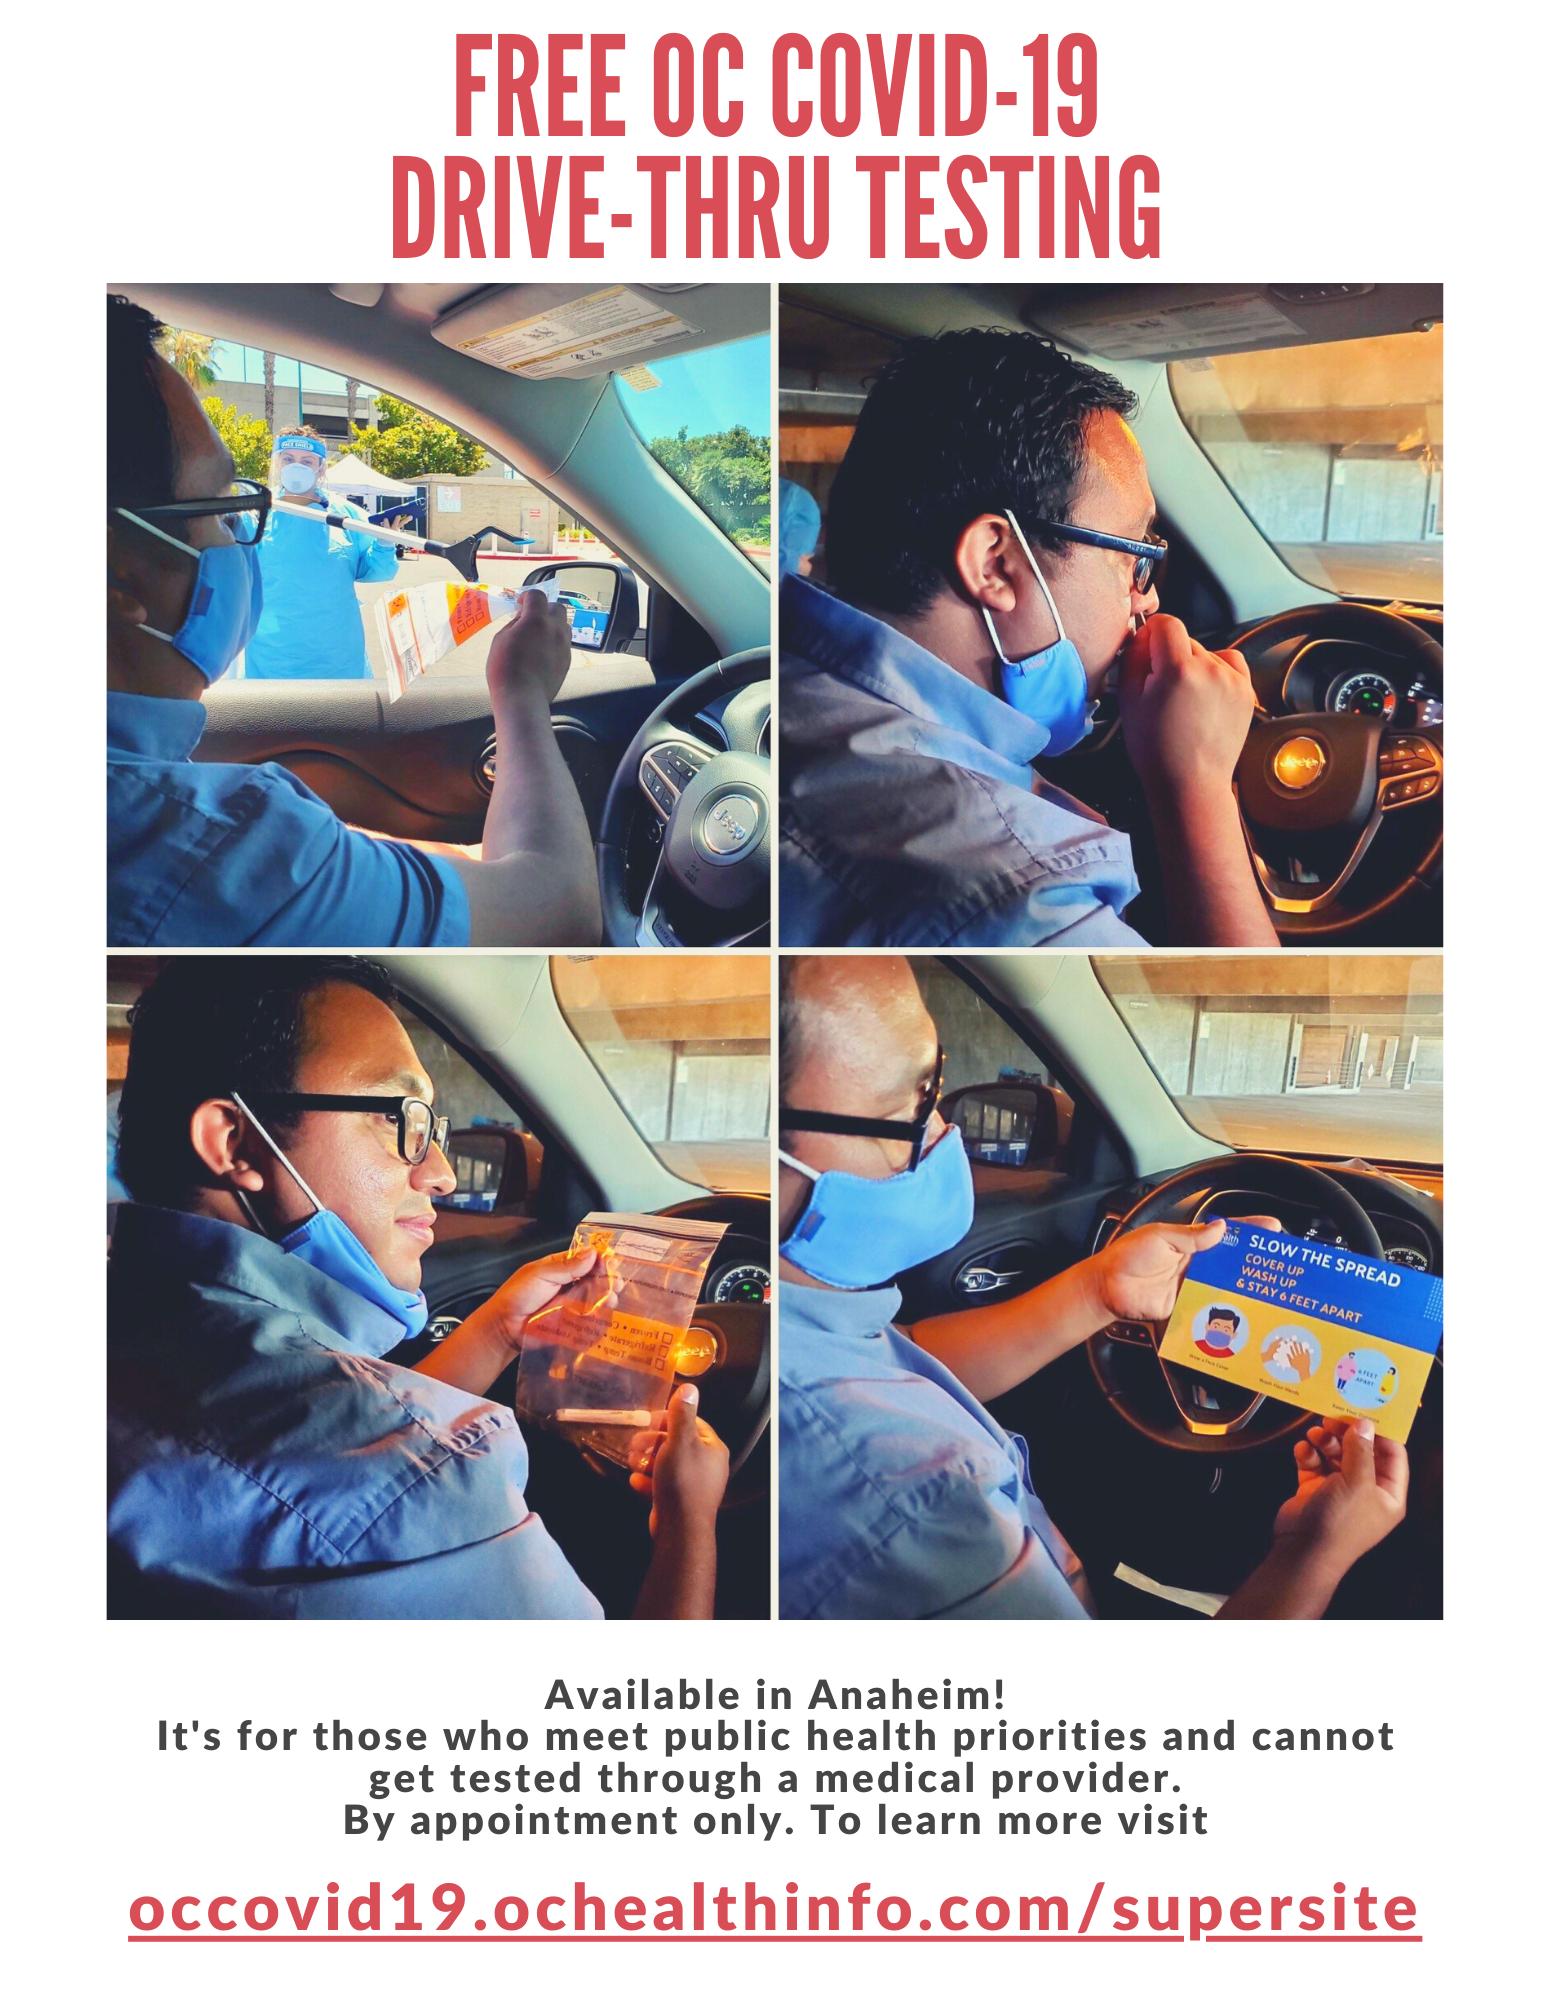 FREE OC COVID-19 DRIVE-THRU TESTING